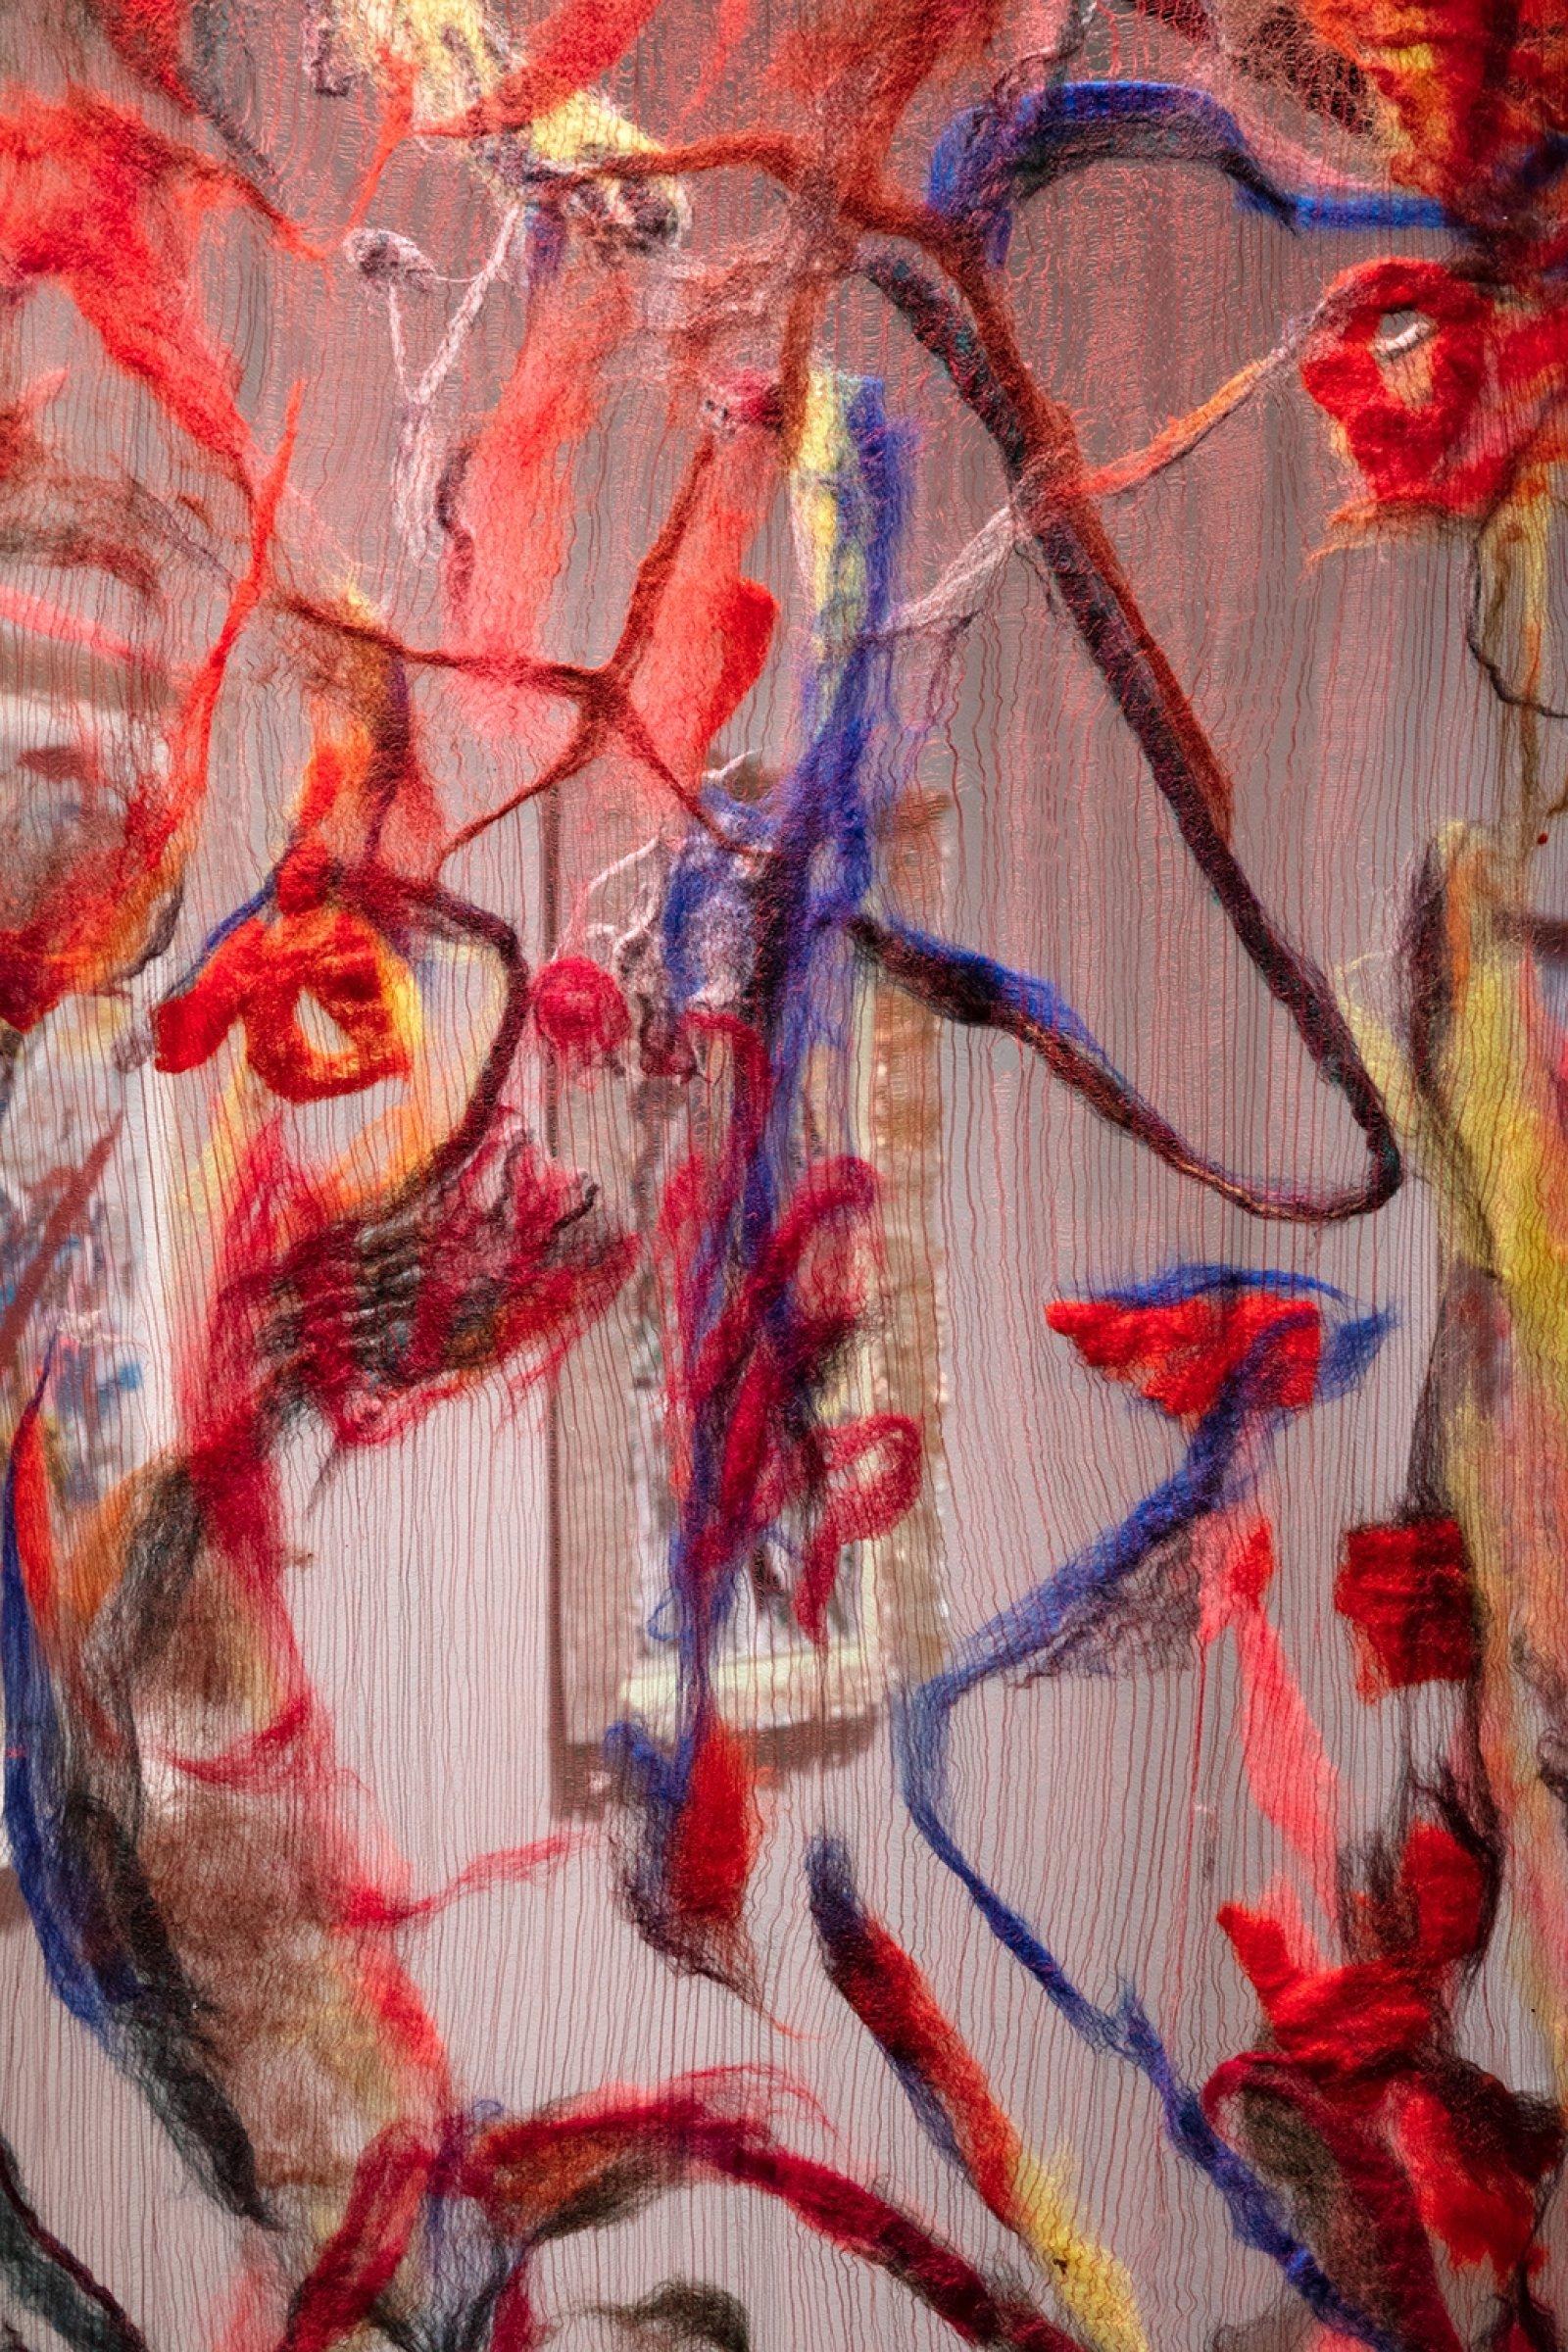 Rebecca Brewer, Scrim: Tweaker (detail), 2019, silk, wool, ball chain, alligator clips, hooks, 103 x 39 in. (262 x 99 cm). Installation view, Waves and Waves, Oakville Galleries, Oakville, 2019